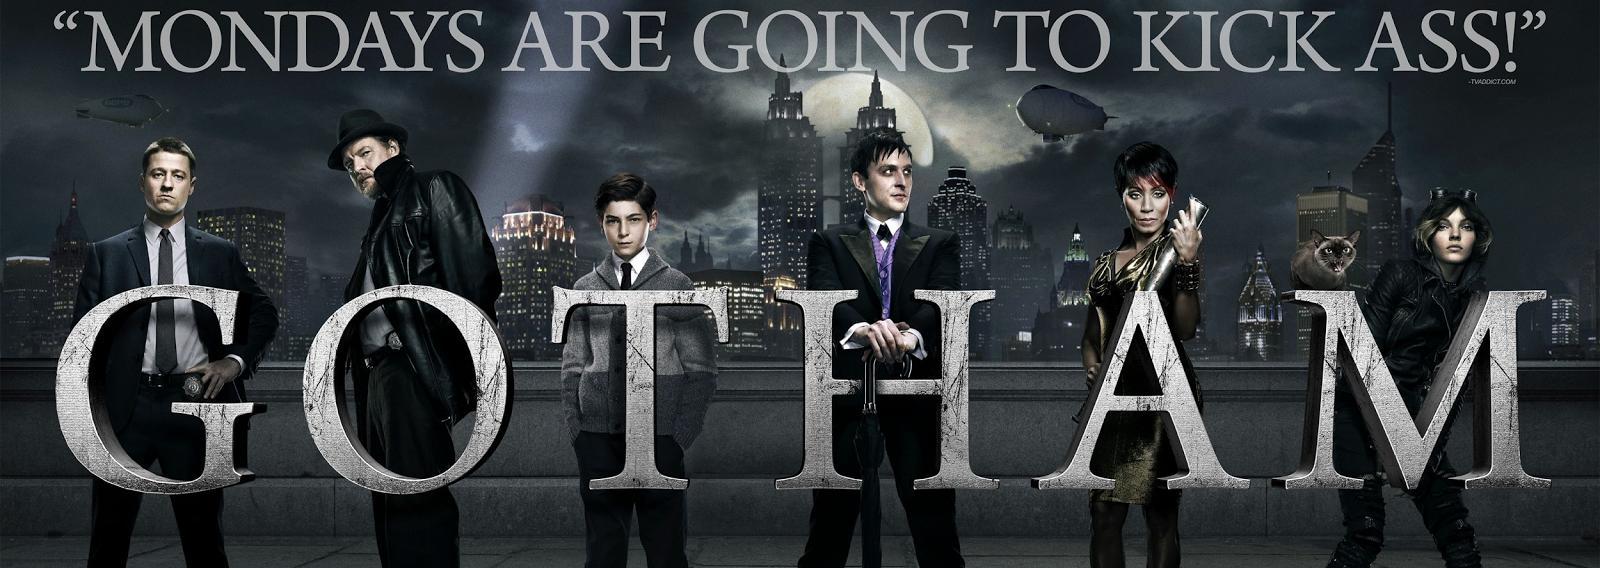 Gotham: Final Preview